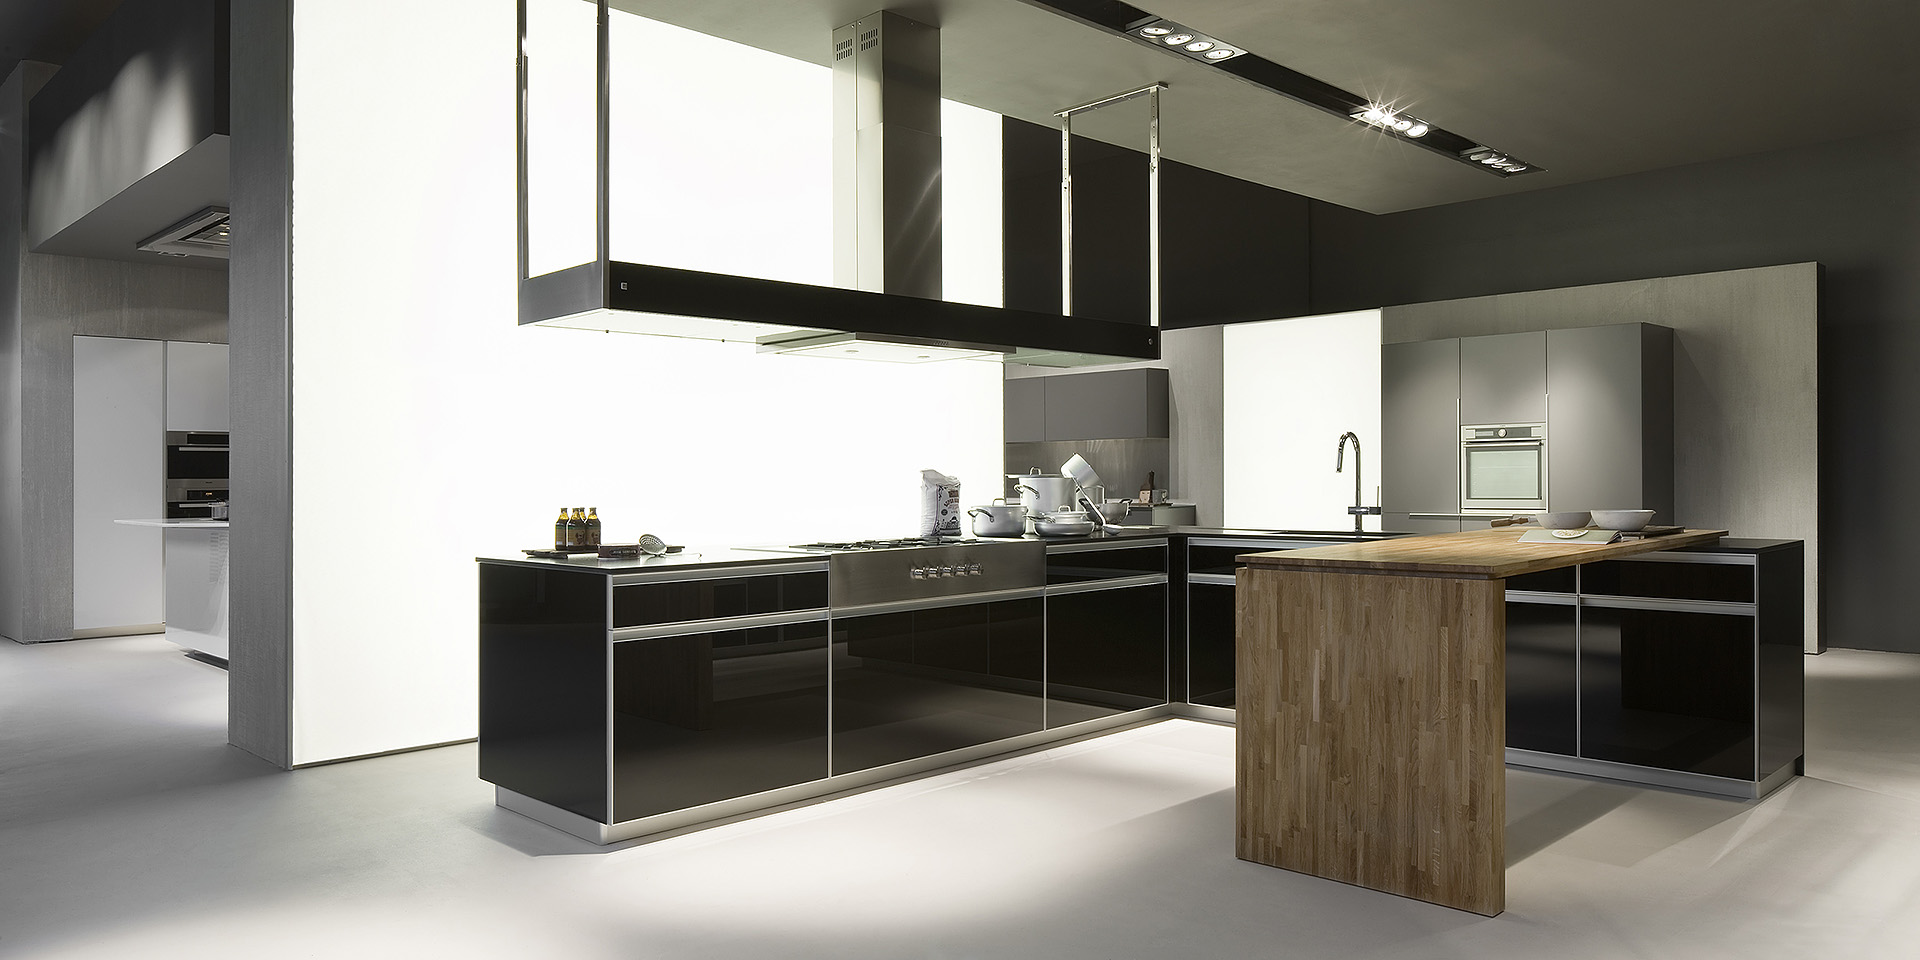 Effeti finest exshowroom display premium kitchen units from effeti evoluzione kitchen range - Effeti cucine prezzi ...